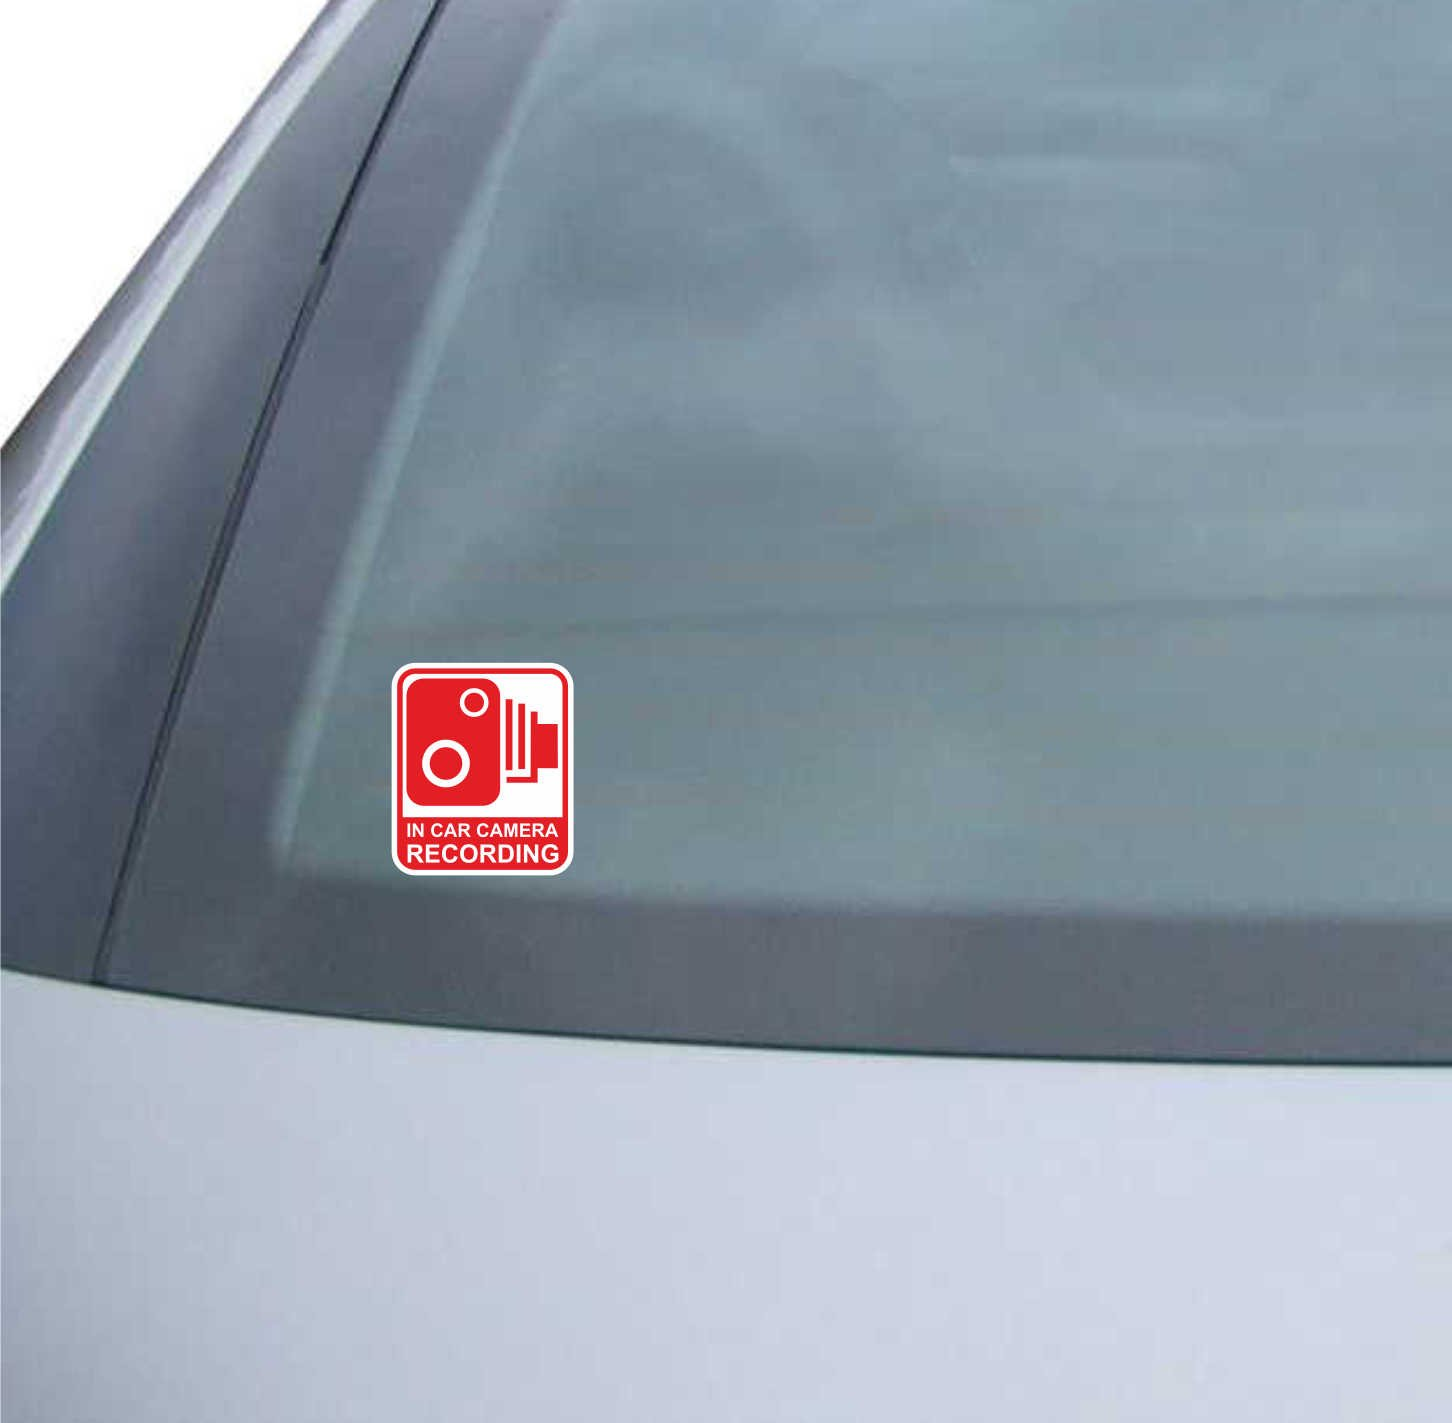 Car CCTV Security In van camera recording Safety External Sticker // Sign